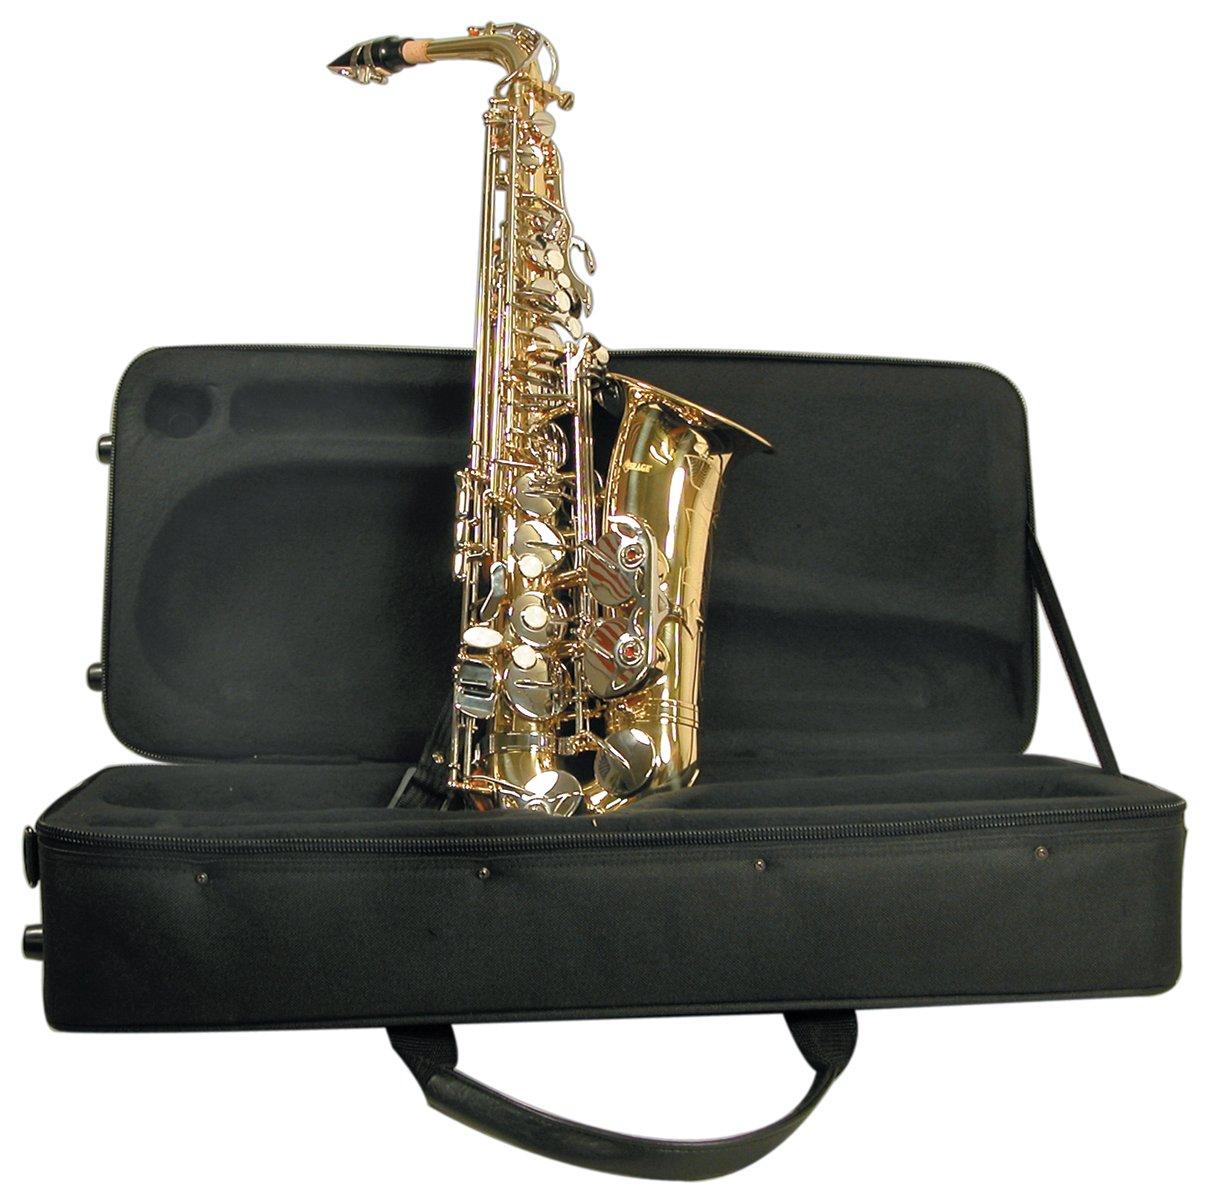 Mirage SX60A Polished Brass Alto Sax with Case